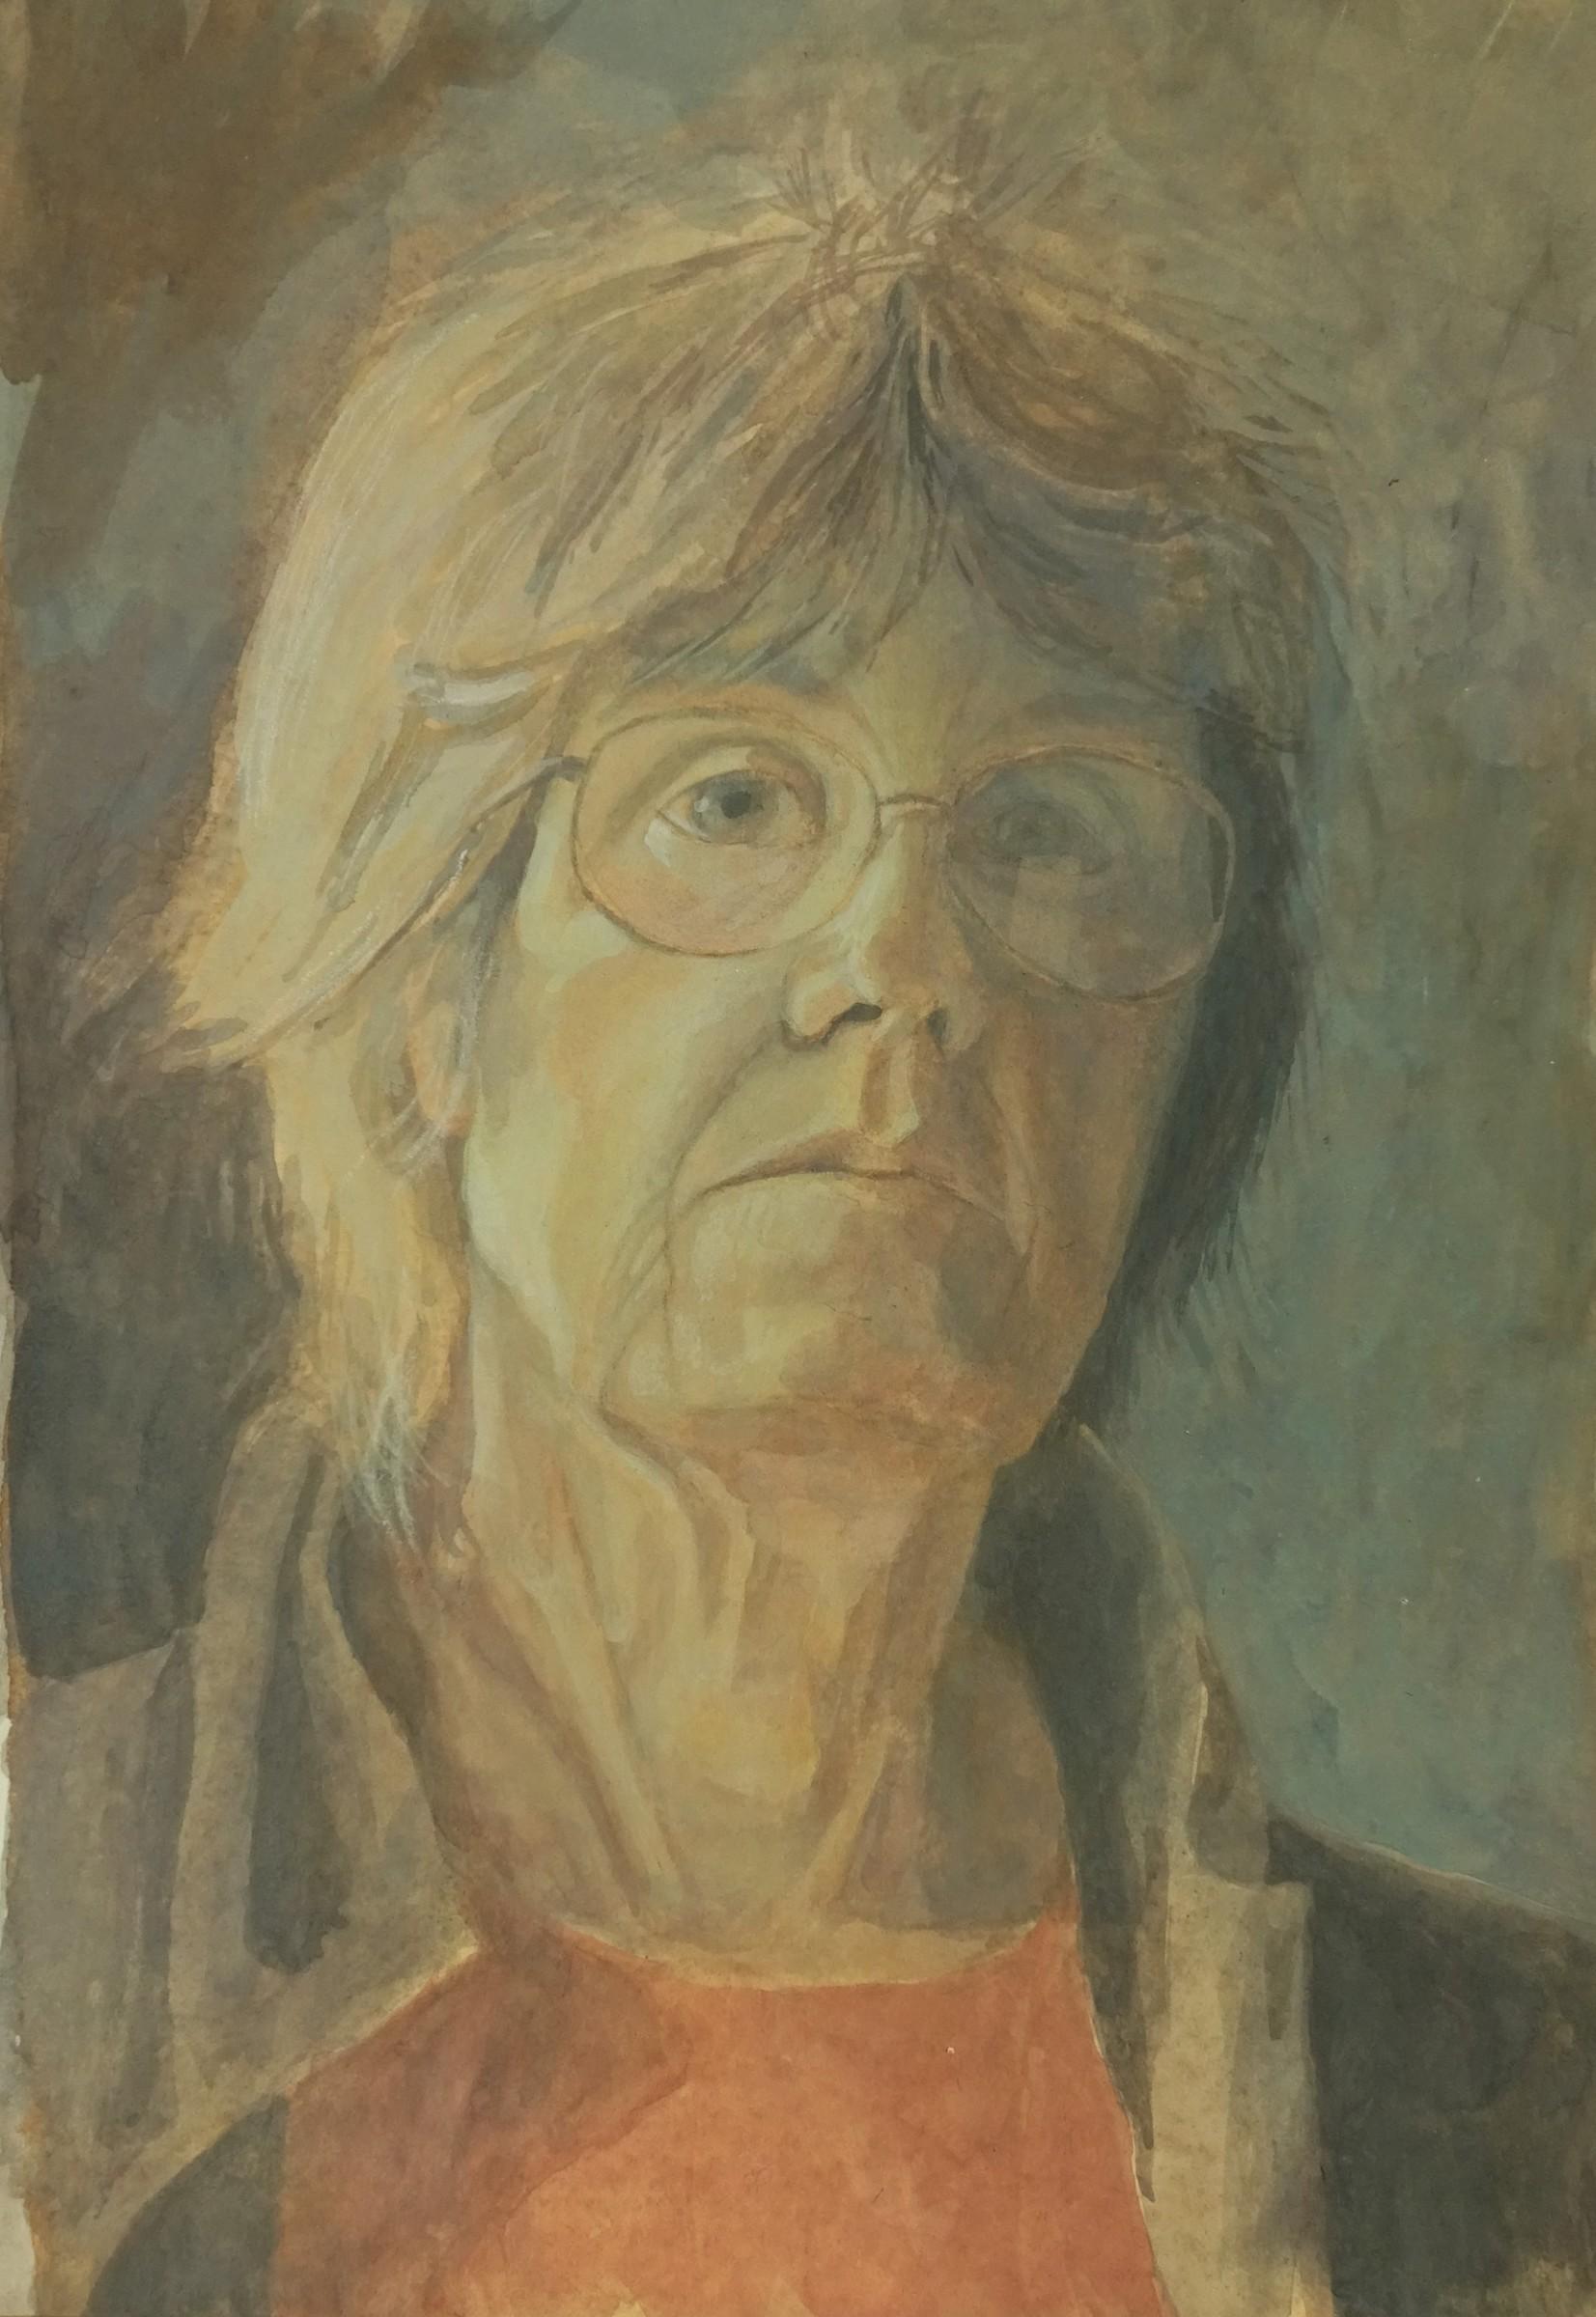 "<span class=""link fancybox-details-link""><a href=""/artists/70-sarah-holliday/works/12065-sarah-holliday-self-portrait/"">View Detail Page</a></span><div class=""artist""><span class=""artist""><strong>Sarah Holliday</strong></span></div><div class=""title""><em>Self Portrait</em></div><div class=""medium"">watercolour & gouache</div><div class=""dimensions"">Frame: 50 x 40 cm<br /> Artwork: 34 x 24 cm</div>"